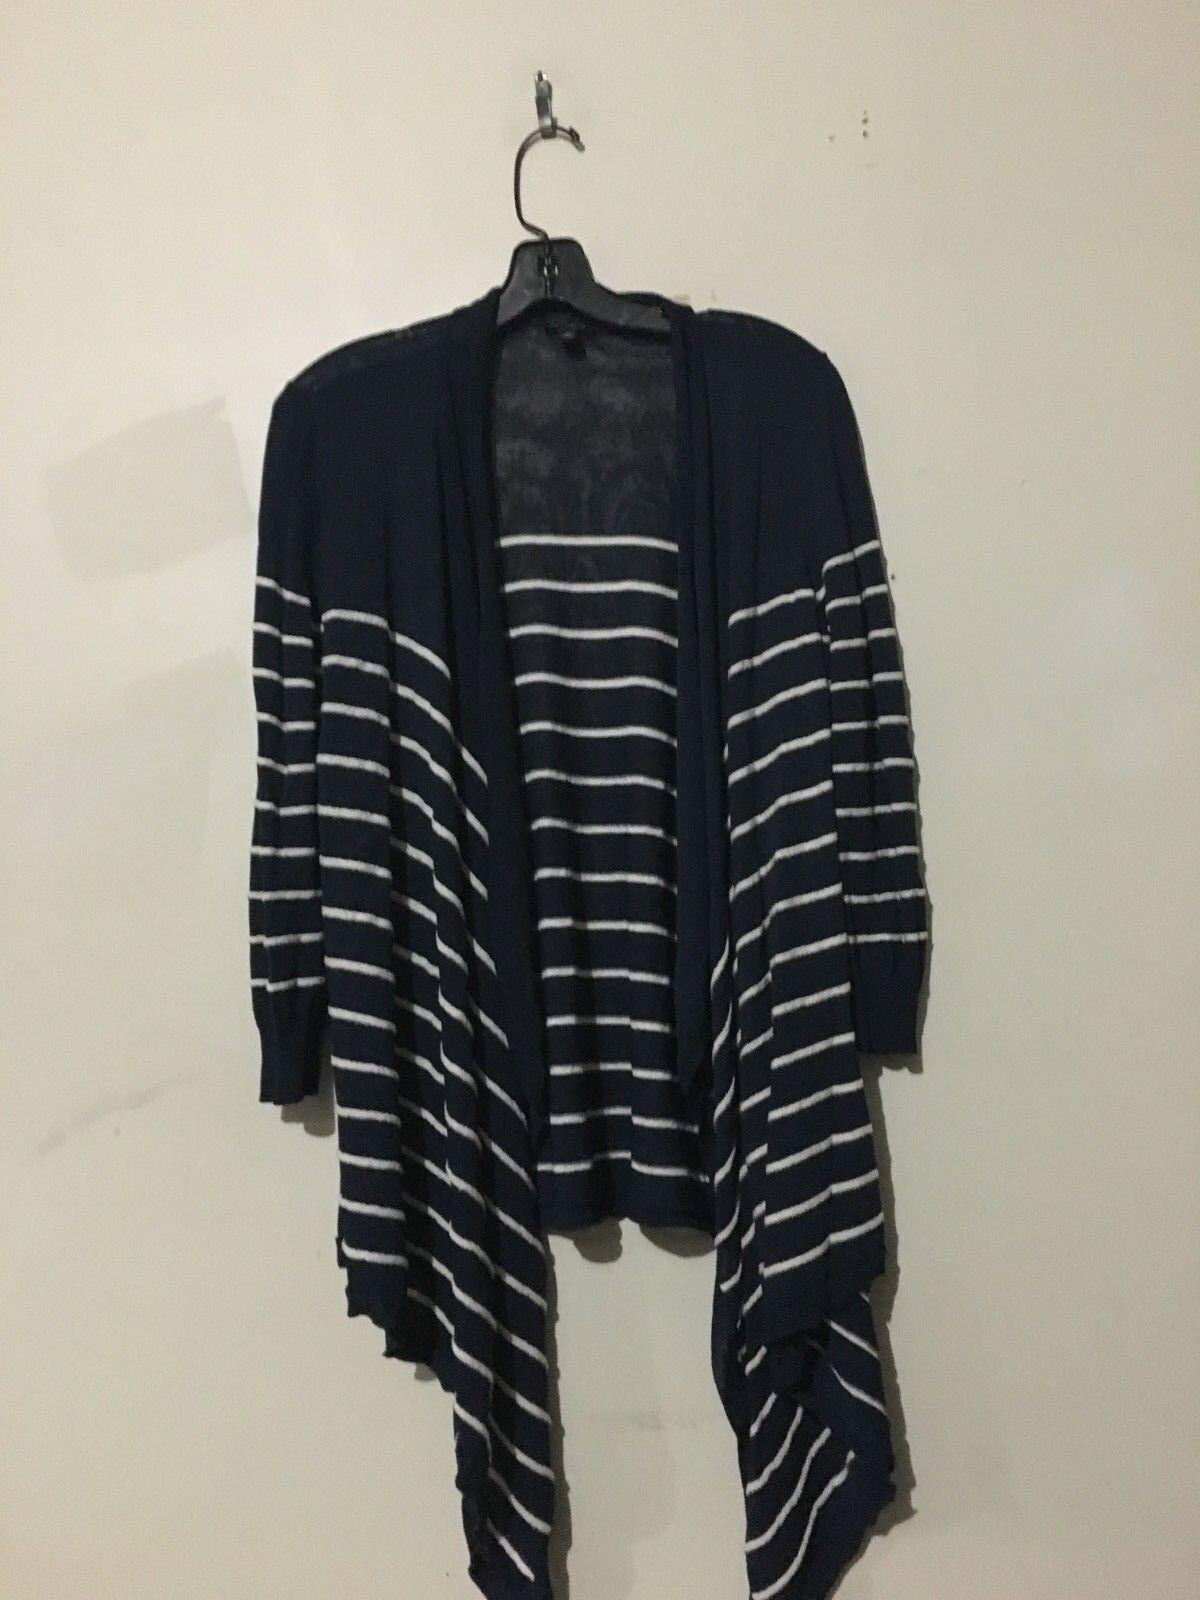 Ann Taylor Navy Cream Drapped Cardigan Sweater Women Stylish Size M